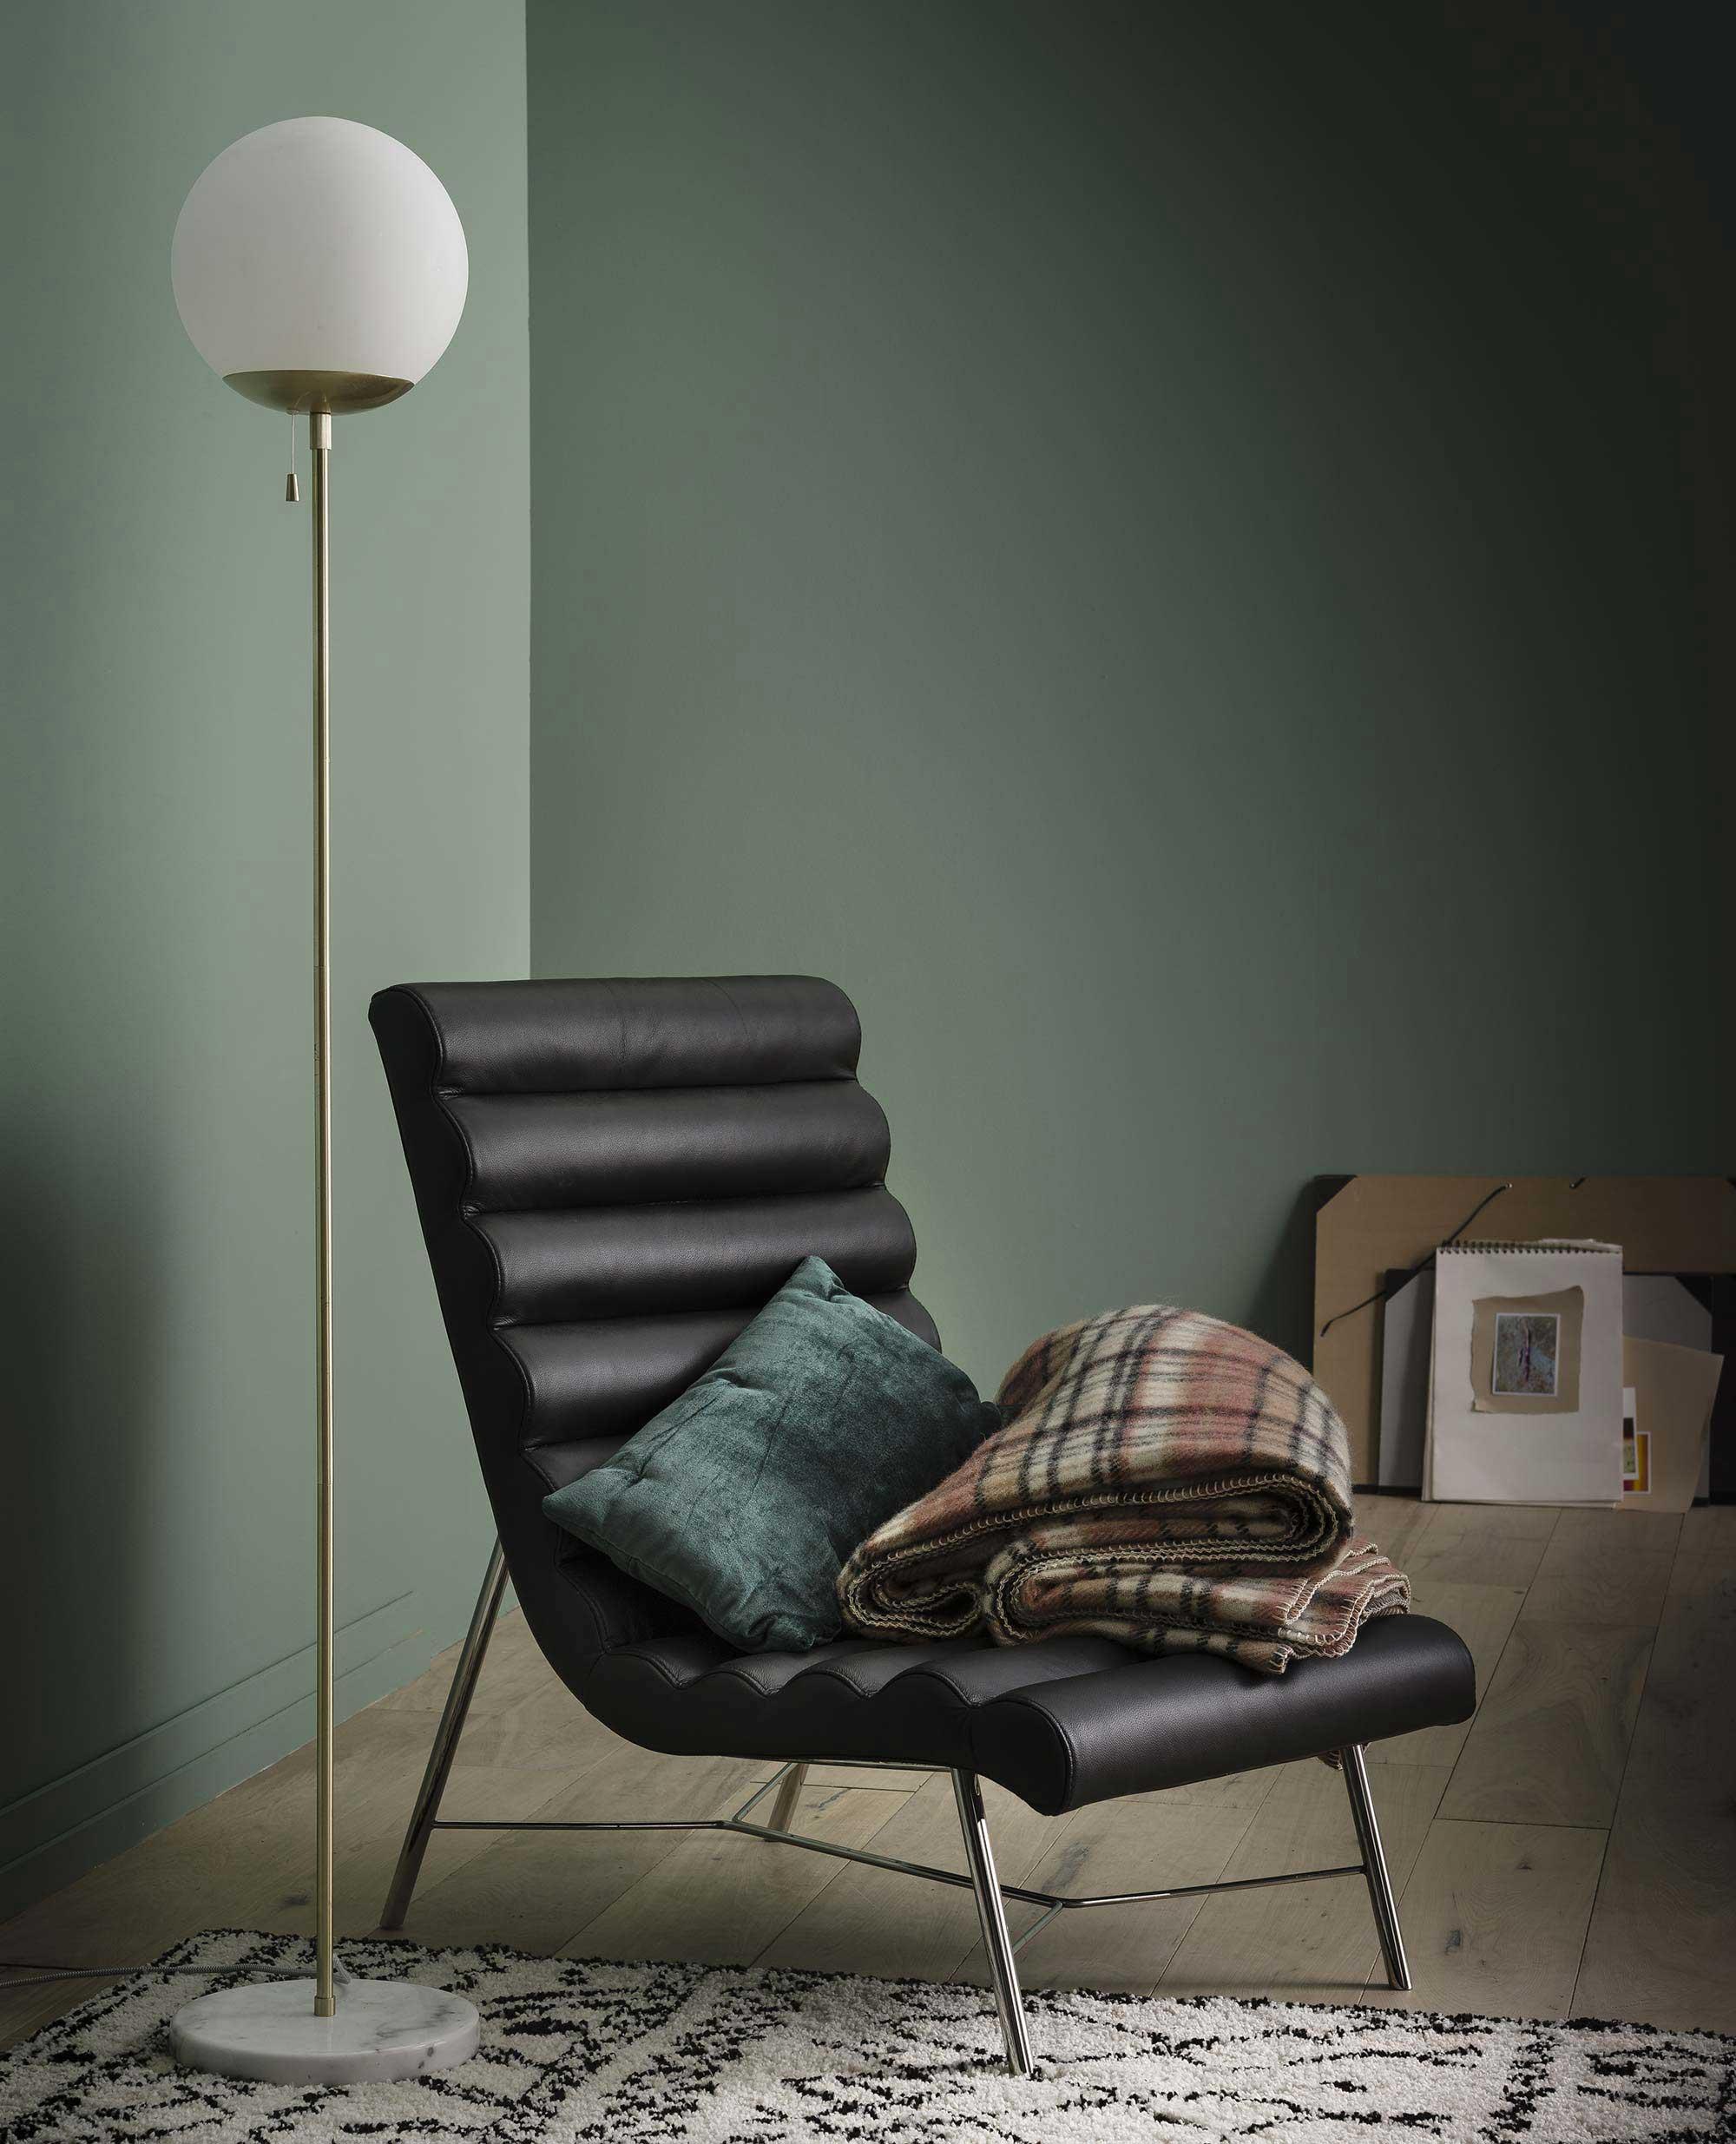 mobilier the socialite family pour la redoute. Black Bedroom Furniture Sets. Home Design Ideas